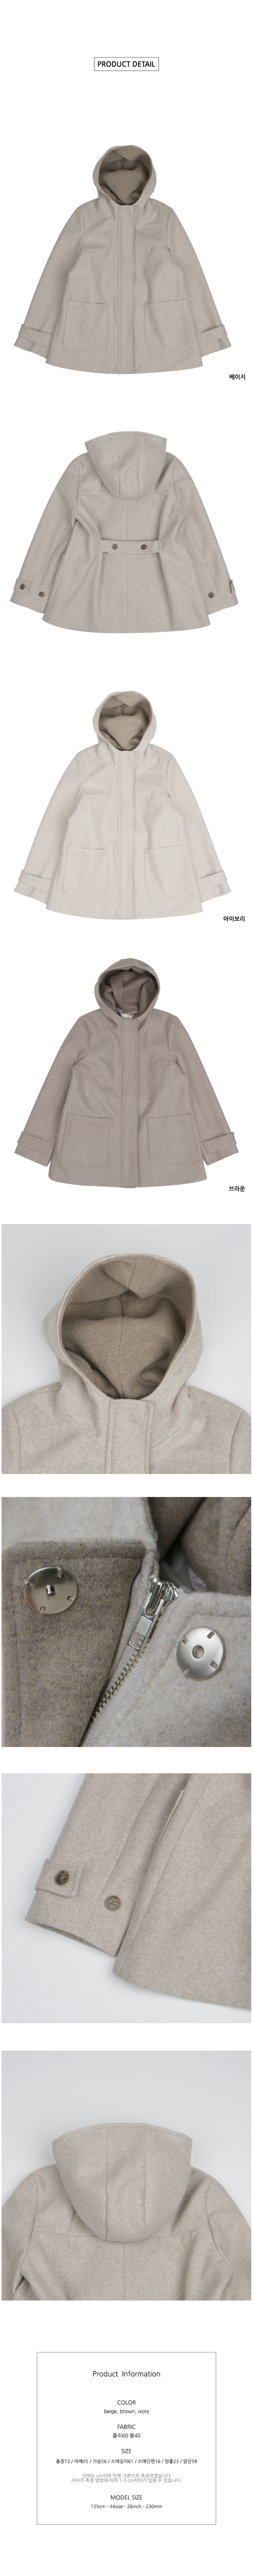 Feminine Daily Hooded Short Coat O#YW337